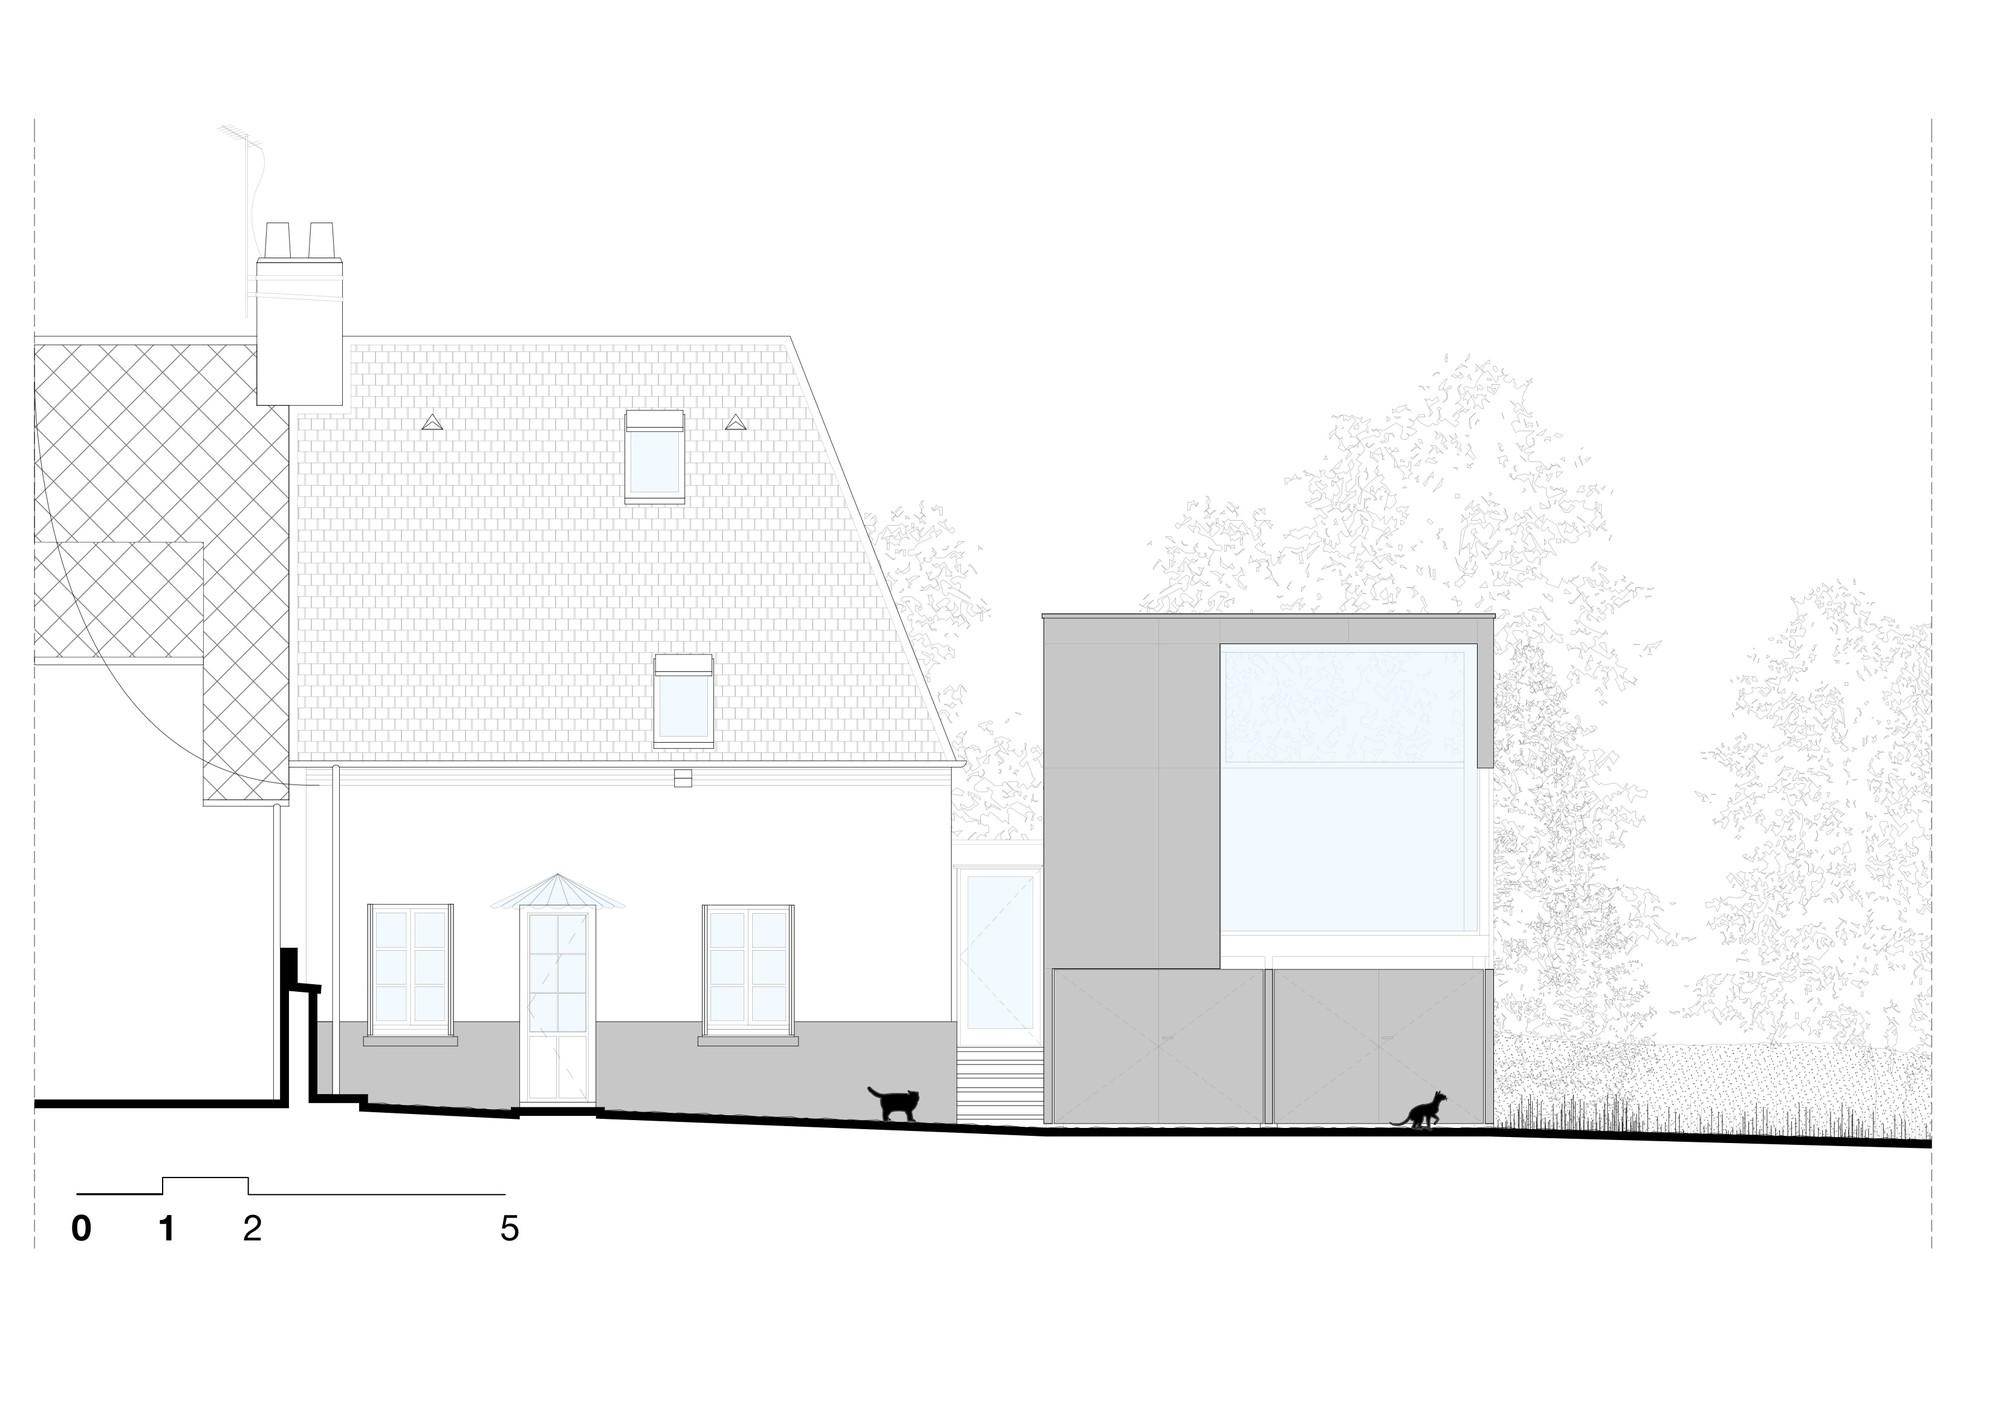 gallery of cliffs impasse ziegler antonin architecte 29. Black Bedroom Furniture Sets. Home Design Ideas